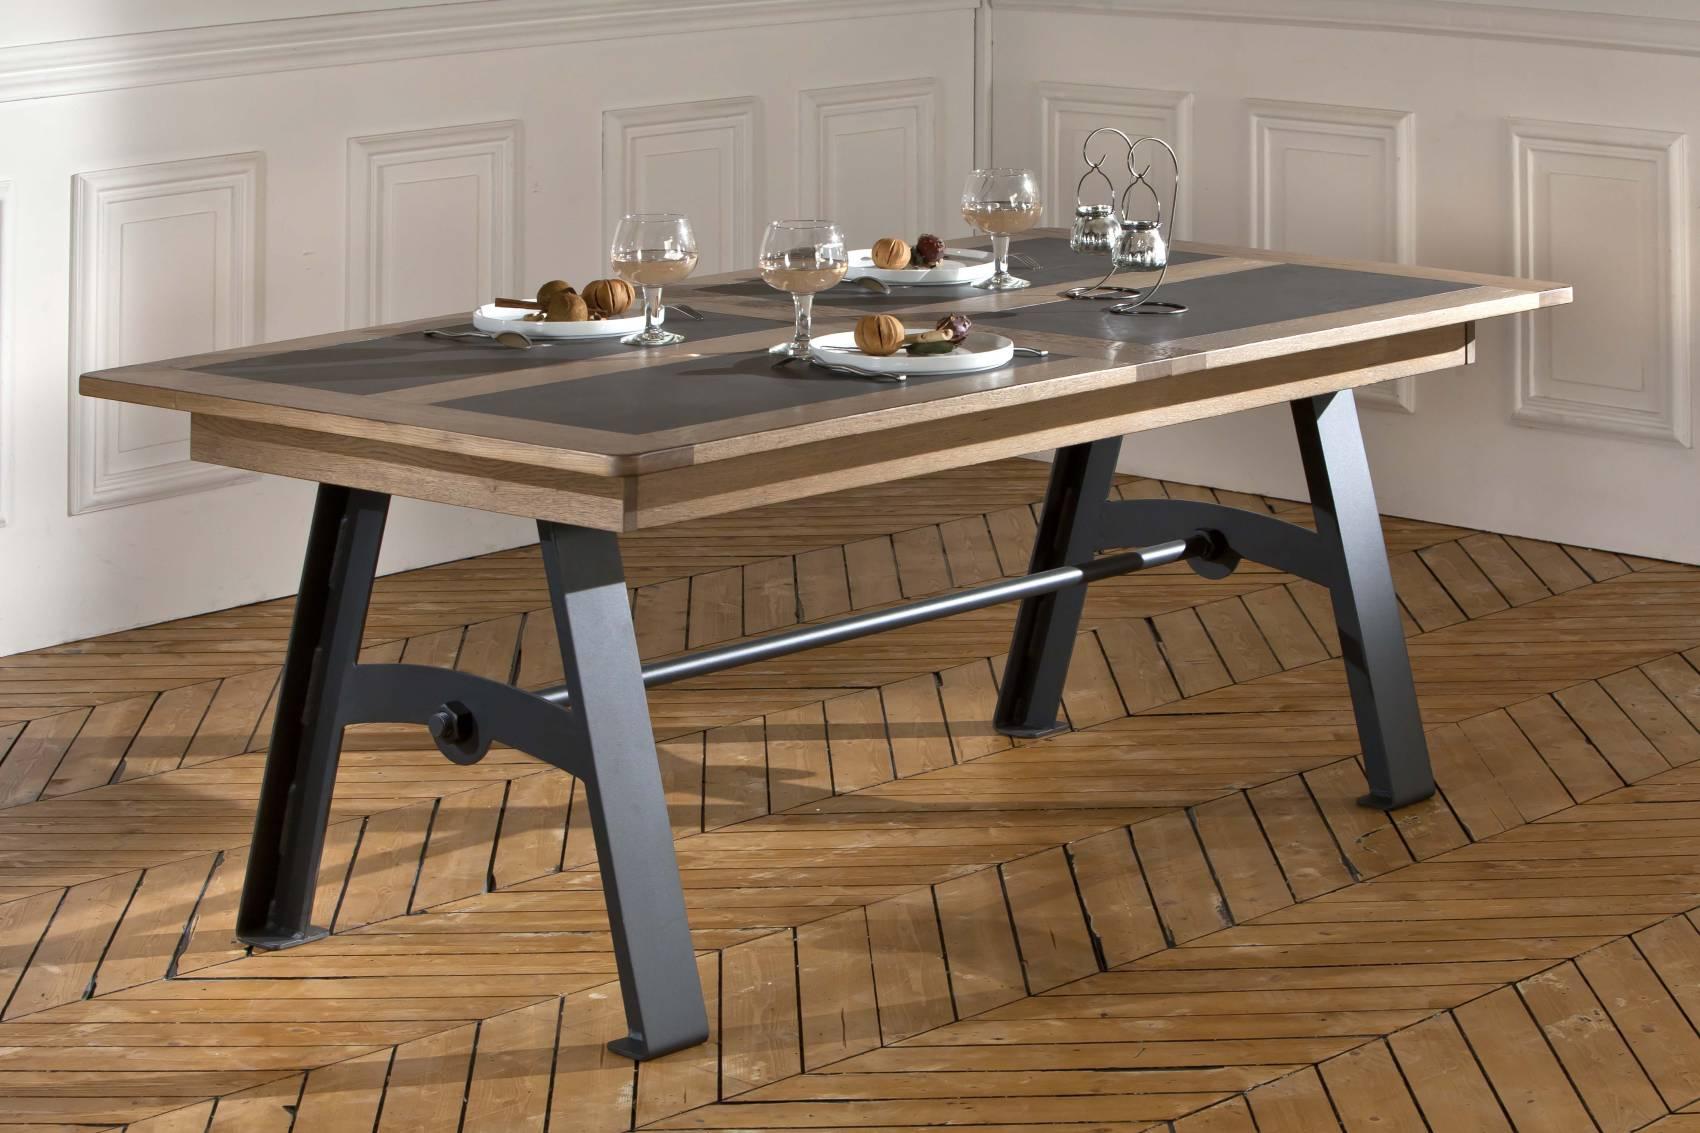 Salle-a-manger-meuble-Deauvil-chene-massif-ateliers-de-langres-nord